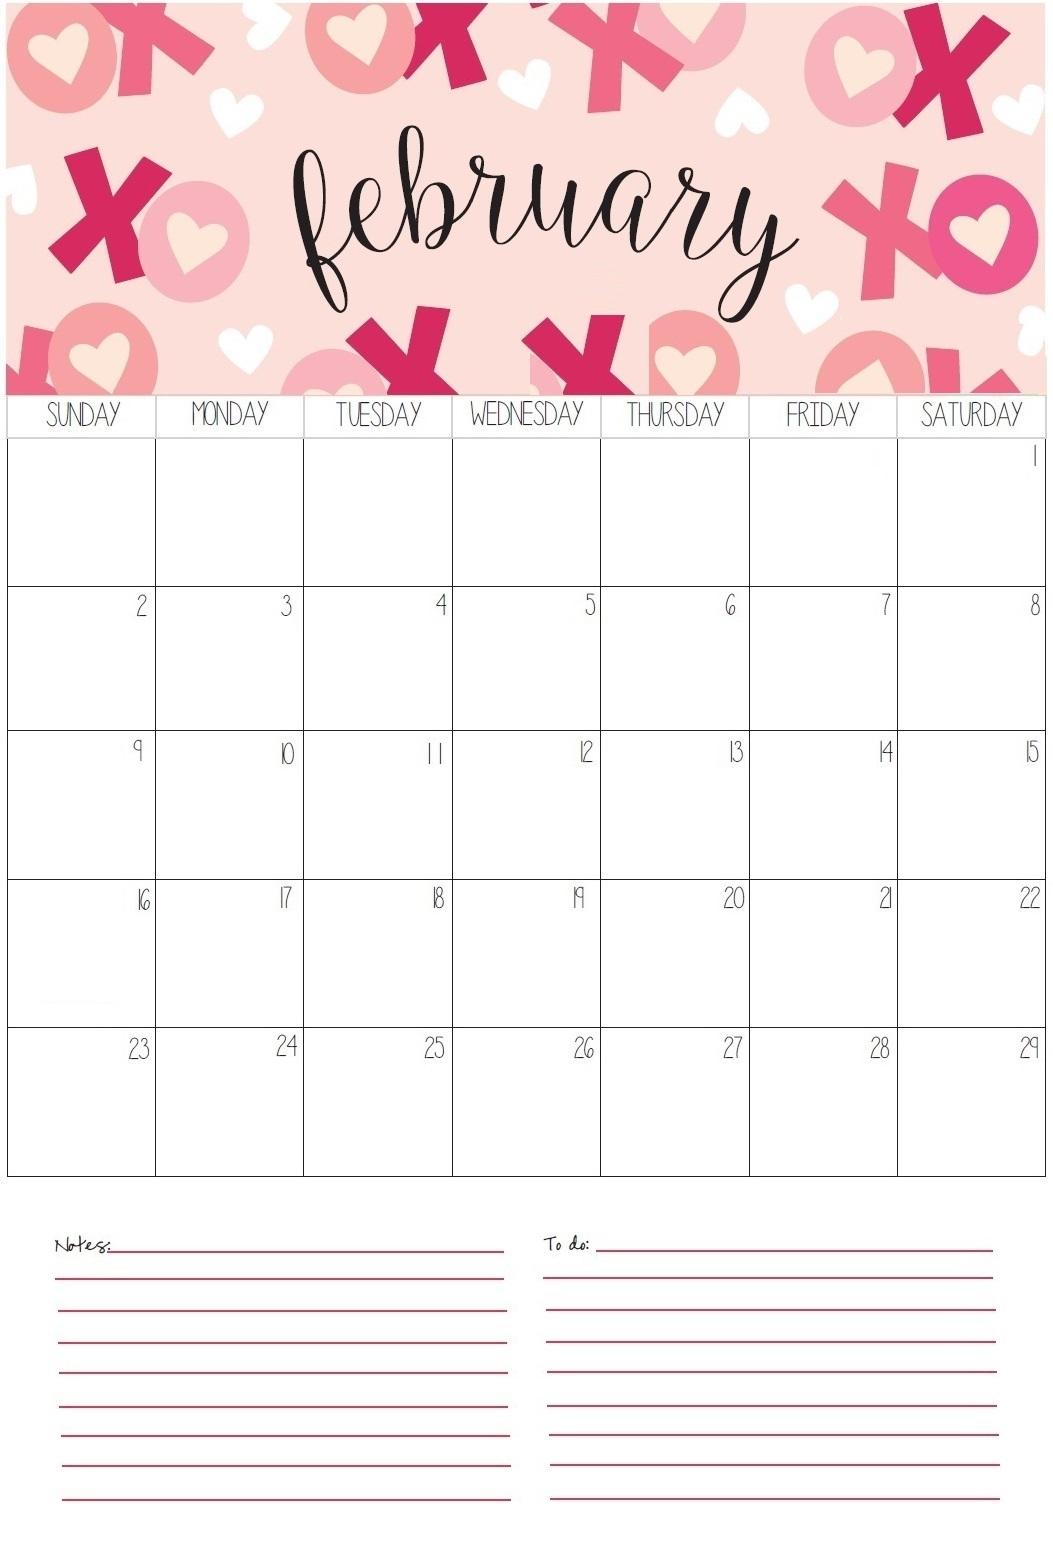 February 2020 Home Wall Calendar